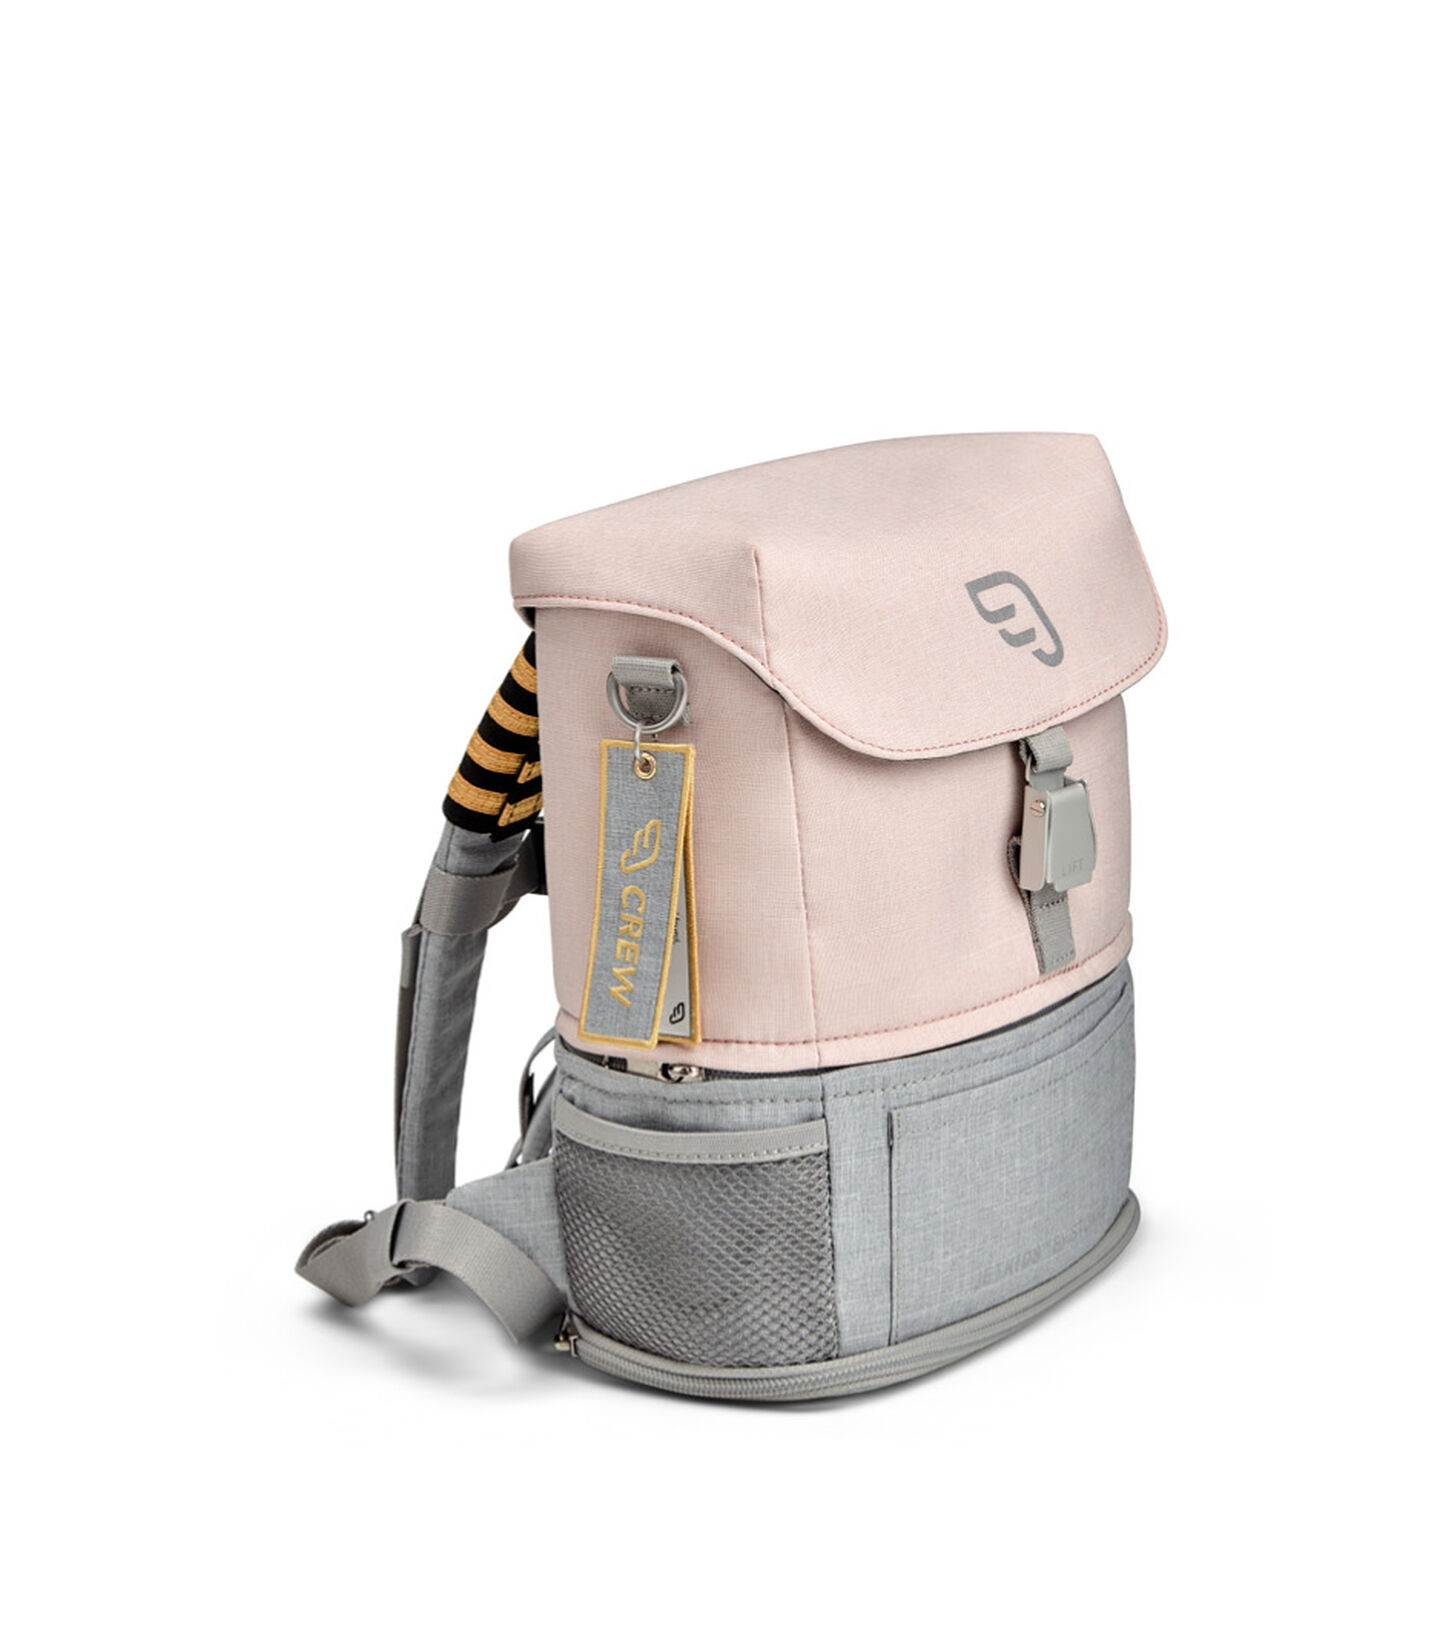 JETKIDS Crew Backpack Pink Lemonade, Rose Limonade, mainview view 1